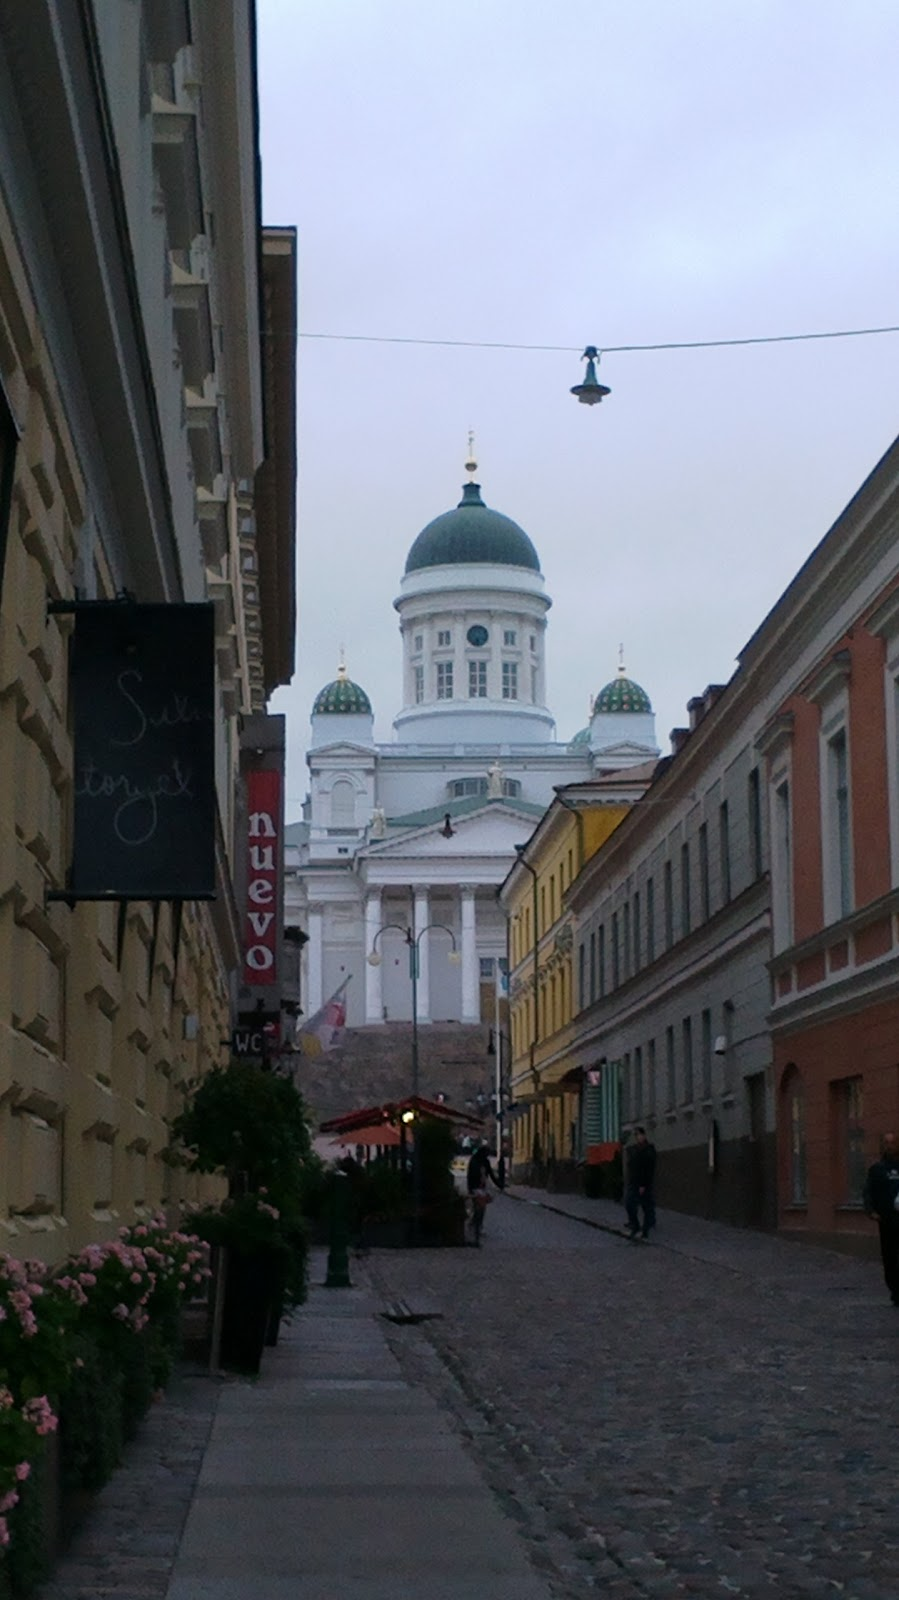 Iltakävely Helsingin keskustassa An evening walk in the centre of Helsinki